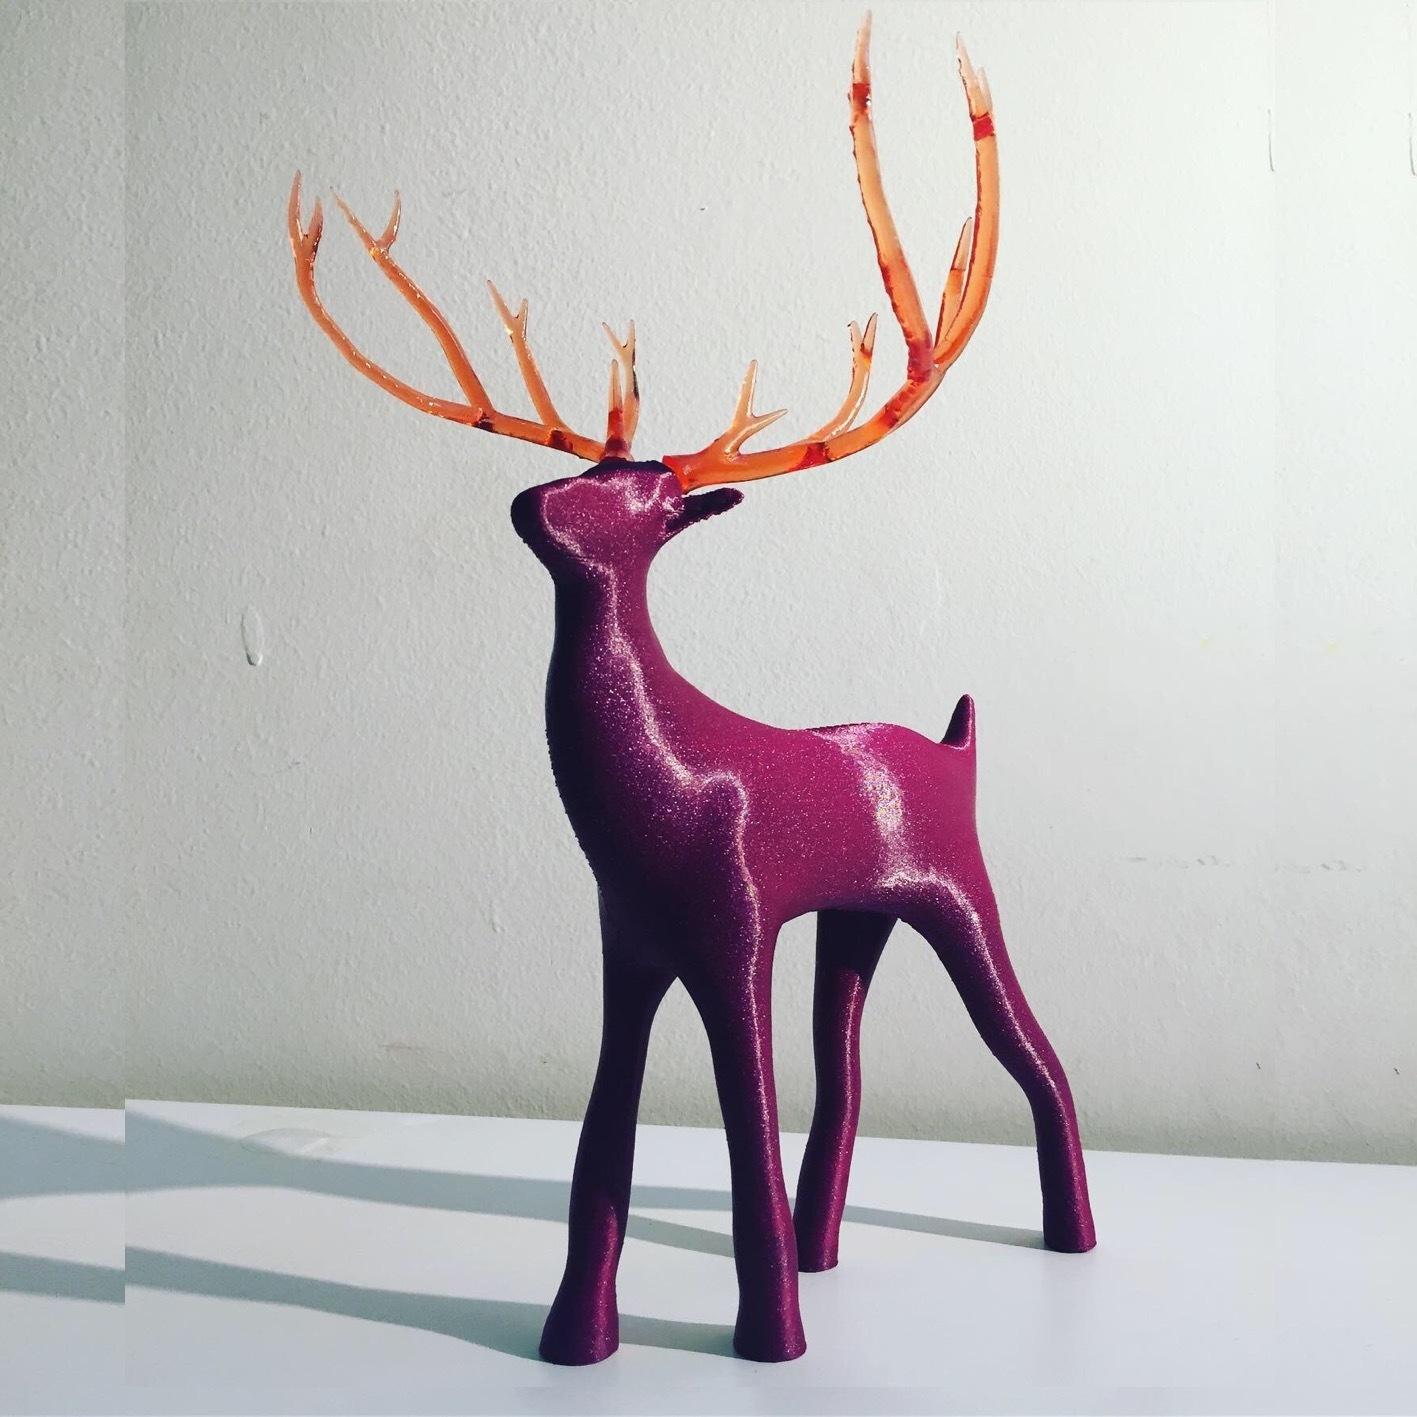 8652AD69-E85D-4B1C-B415-3FB5BDAB2146.JPG Télécharger fichier STL gratuit Reindeer with an antlers twist! • Objet imprimable en 3D, serial_print3r